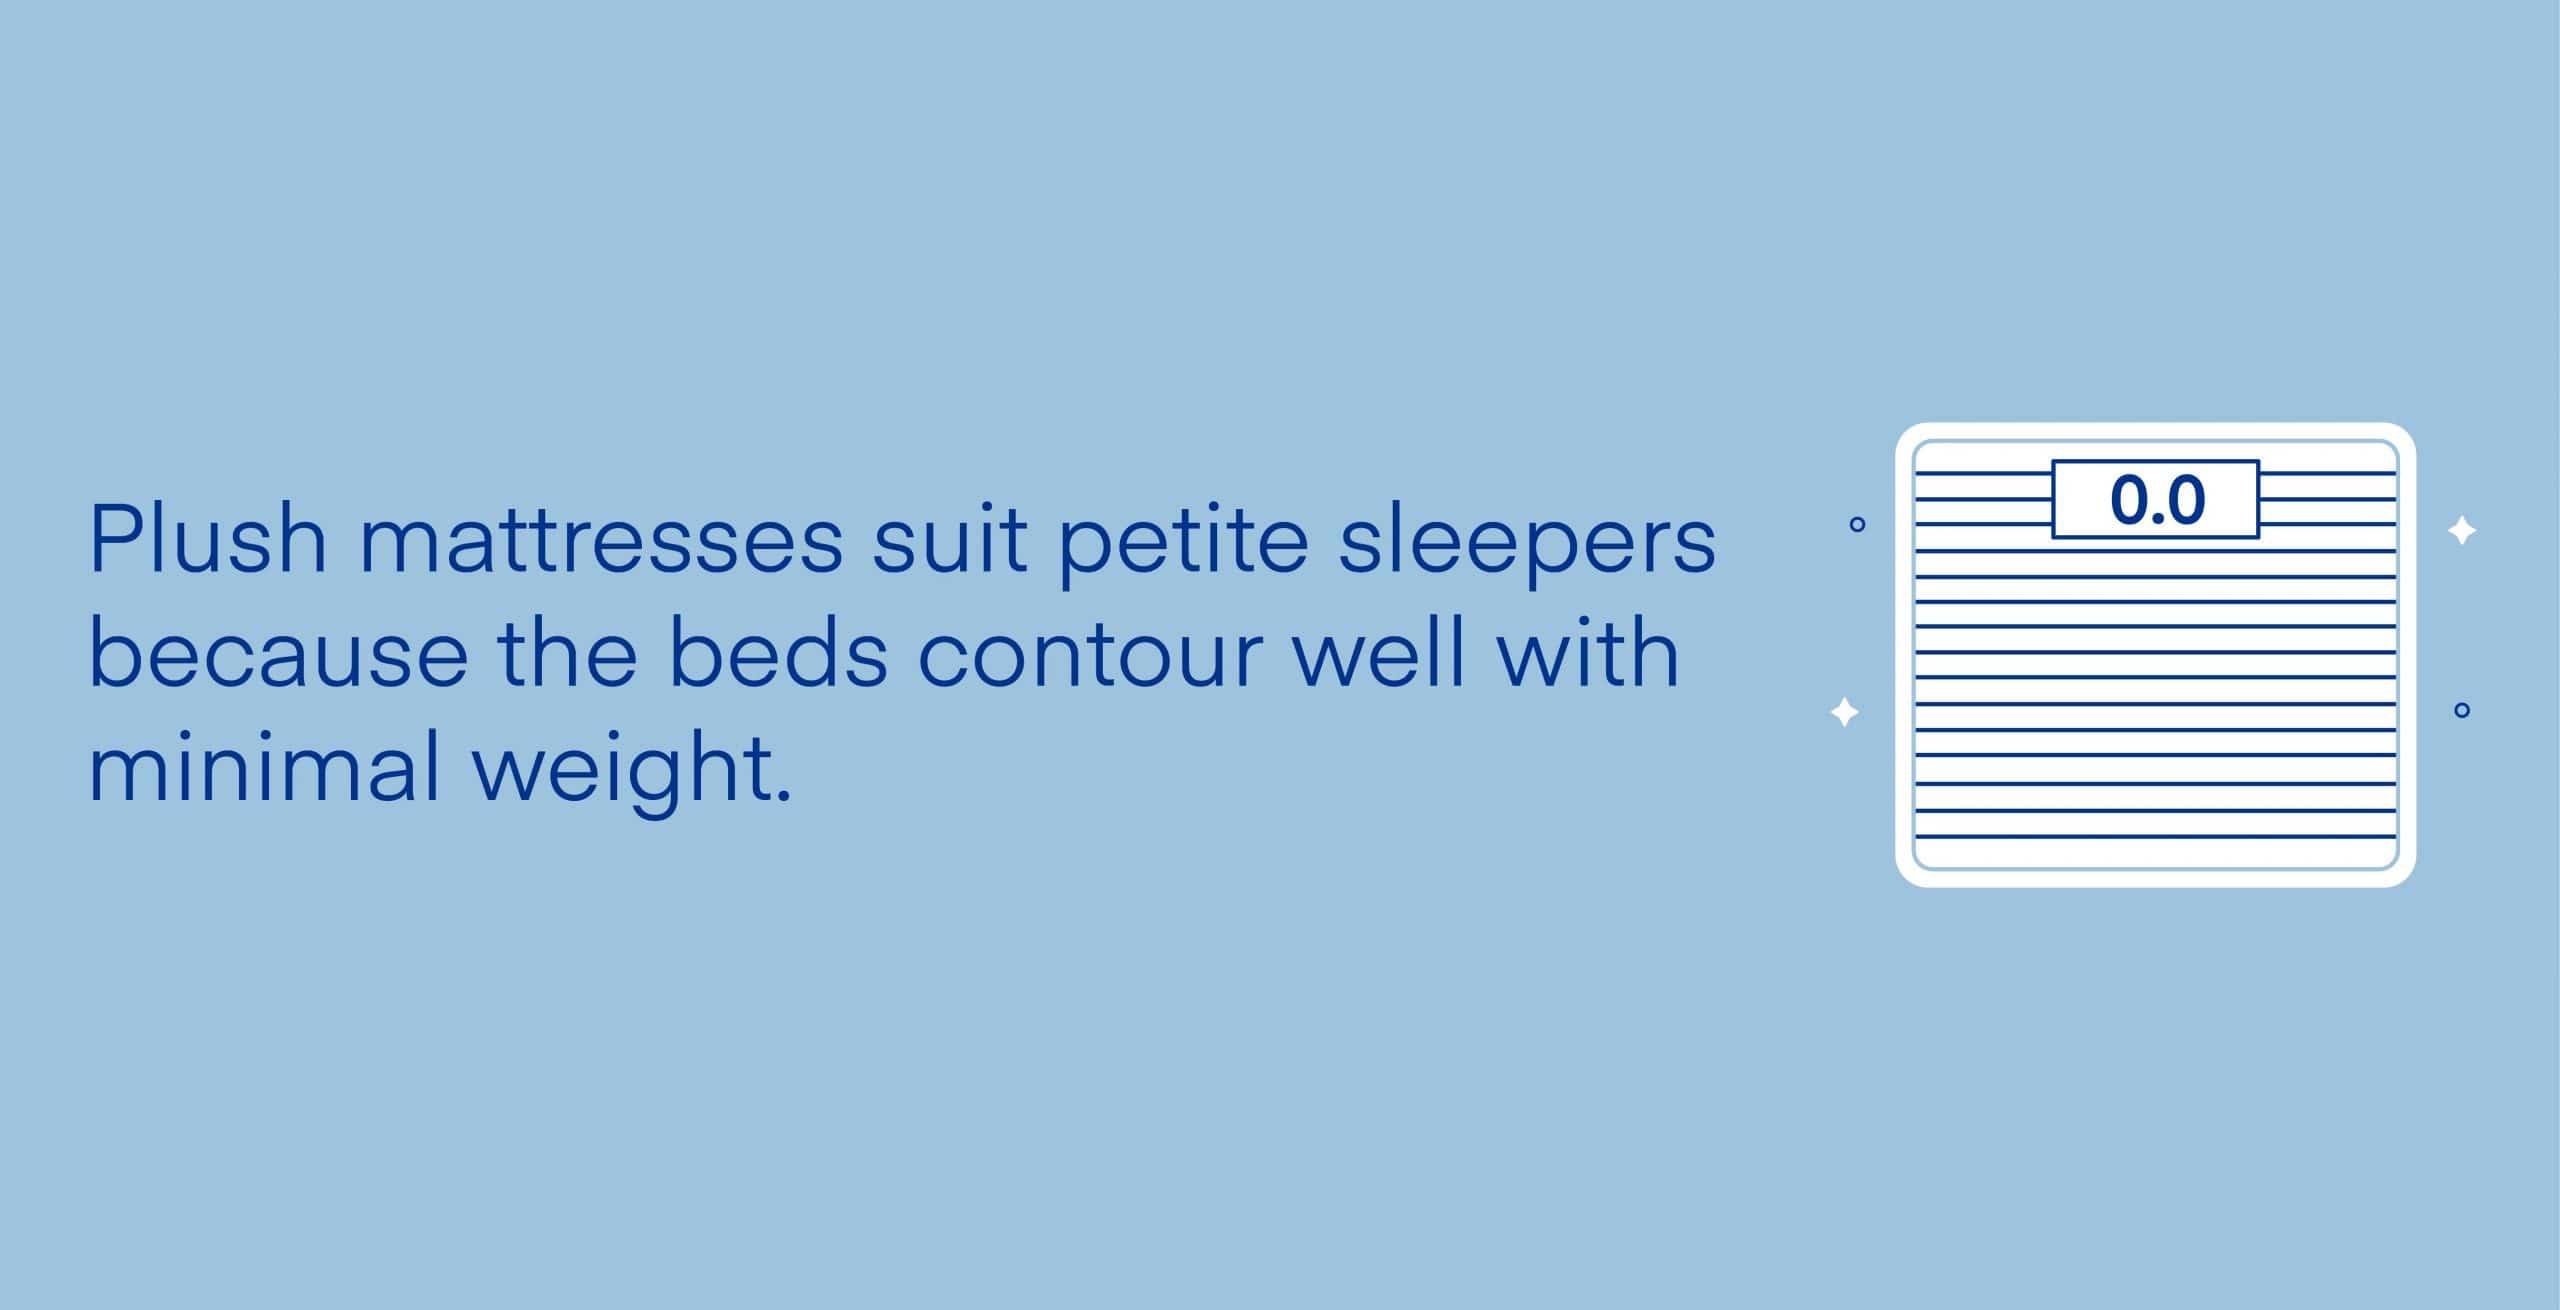 What Is A Plush Mattress?